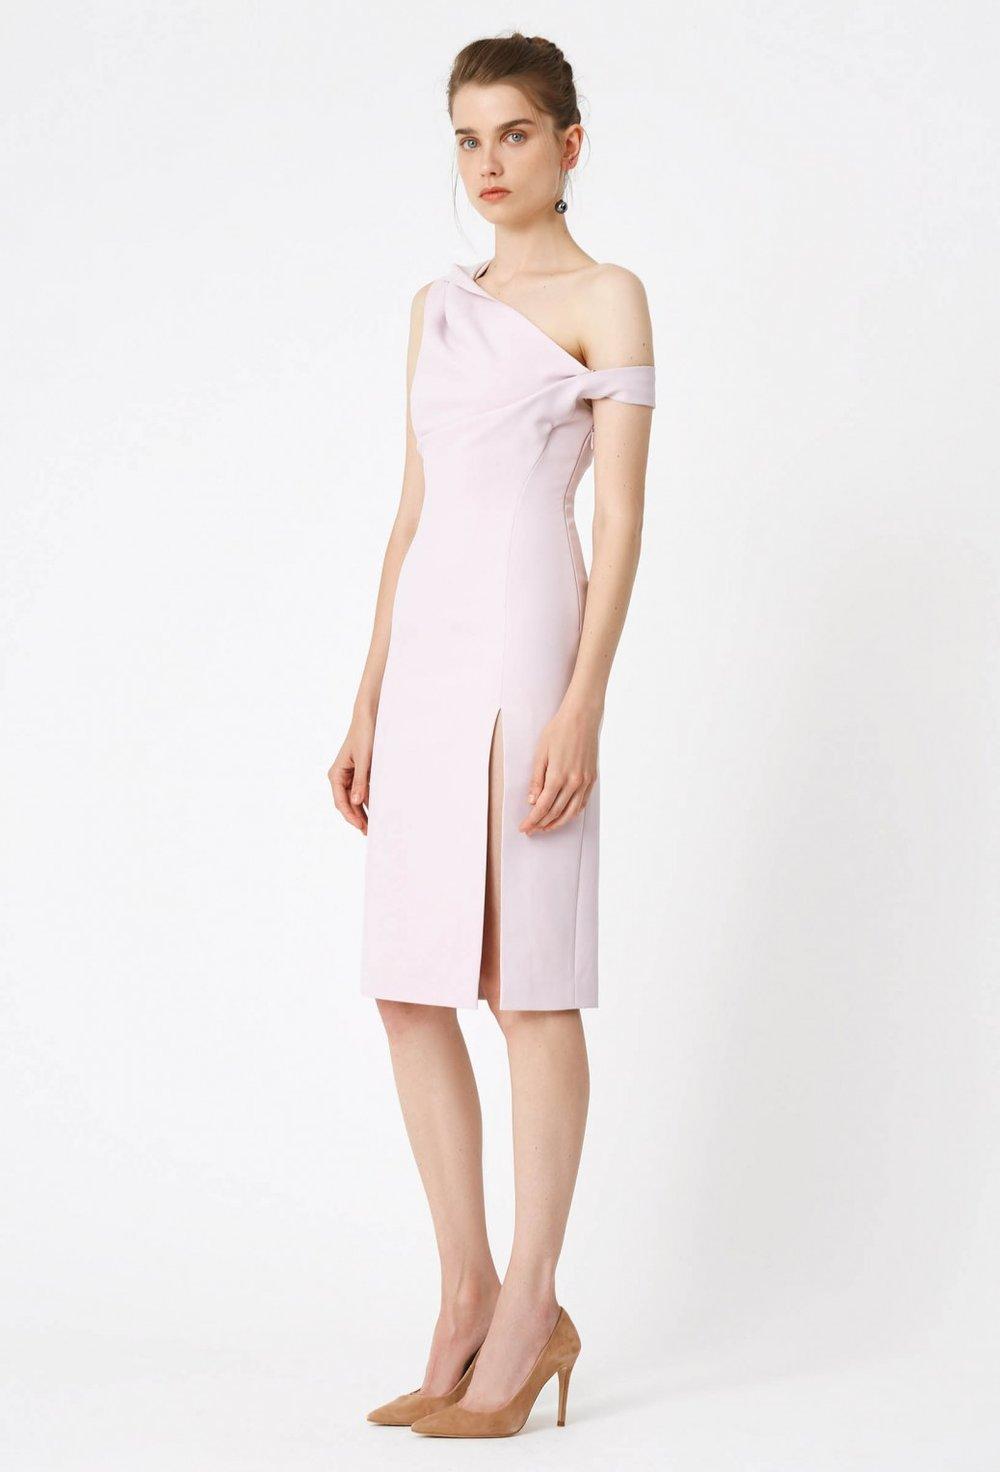 didion_dress_lilac_2.jpg